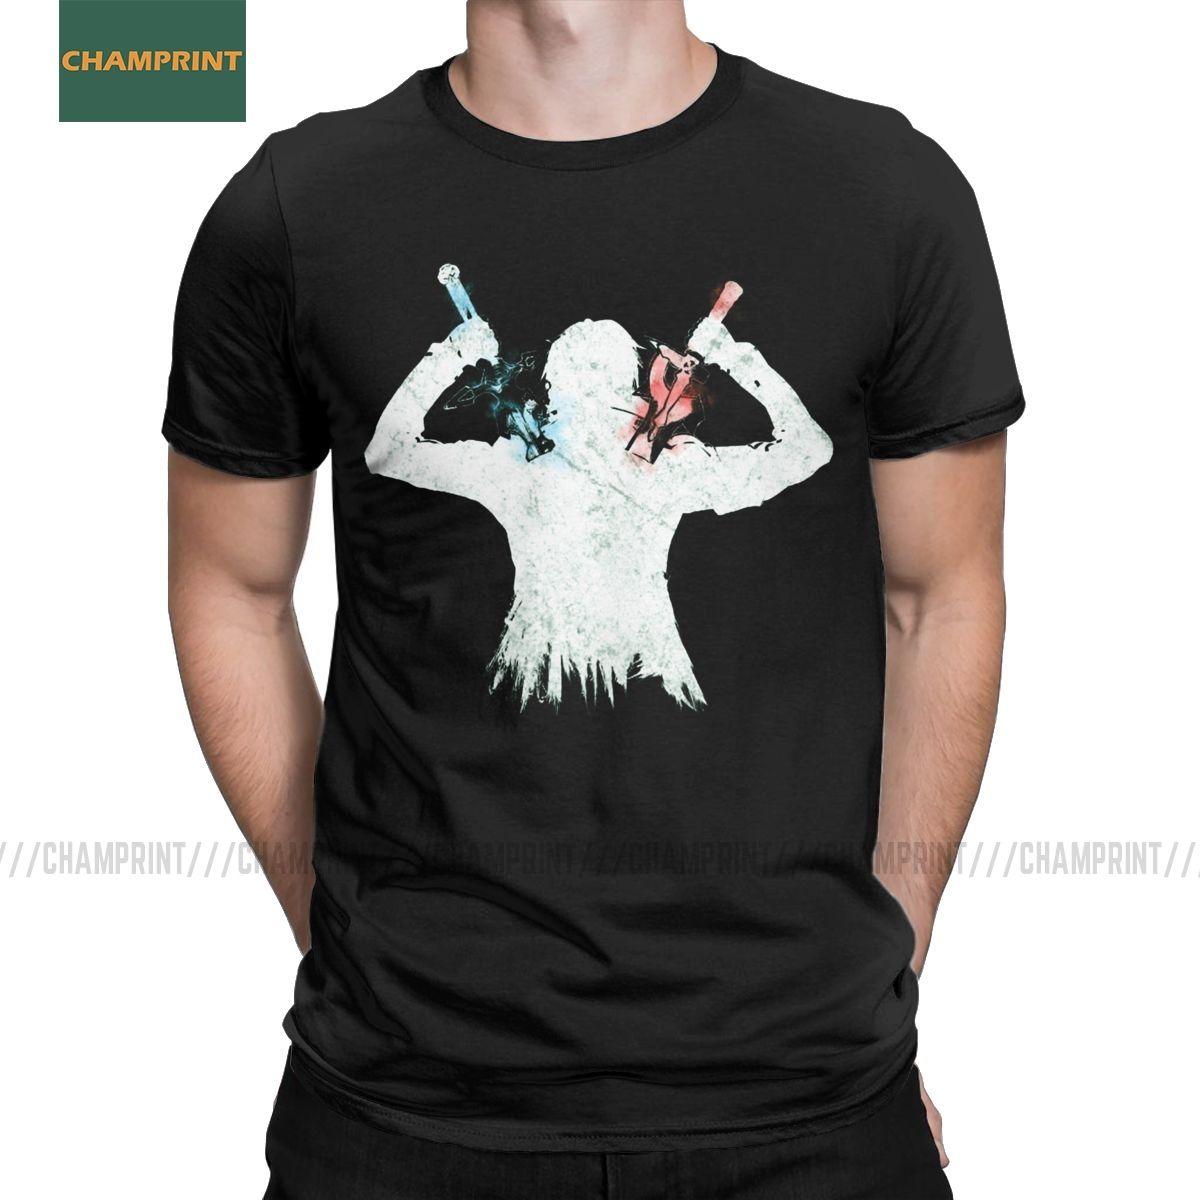 Sport Uomo T-shirt Doppio Lame Sword Art Online manica corta Asuna Kirito Anime Manga Yuuki gioco Sao maglietta impressionante Cotton Tee Shirt